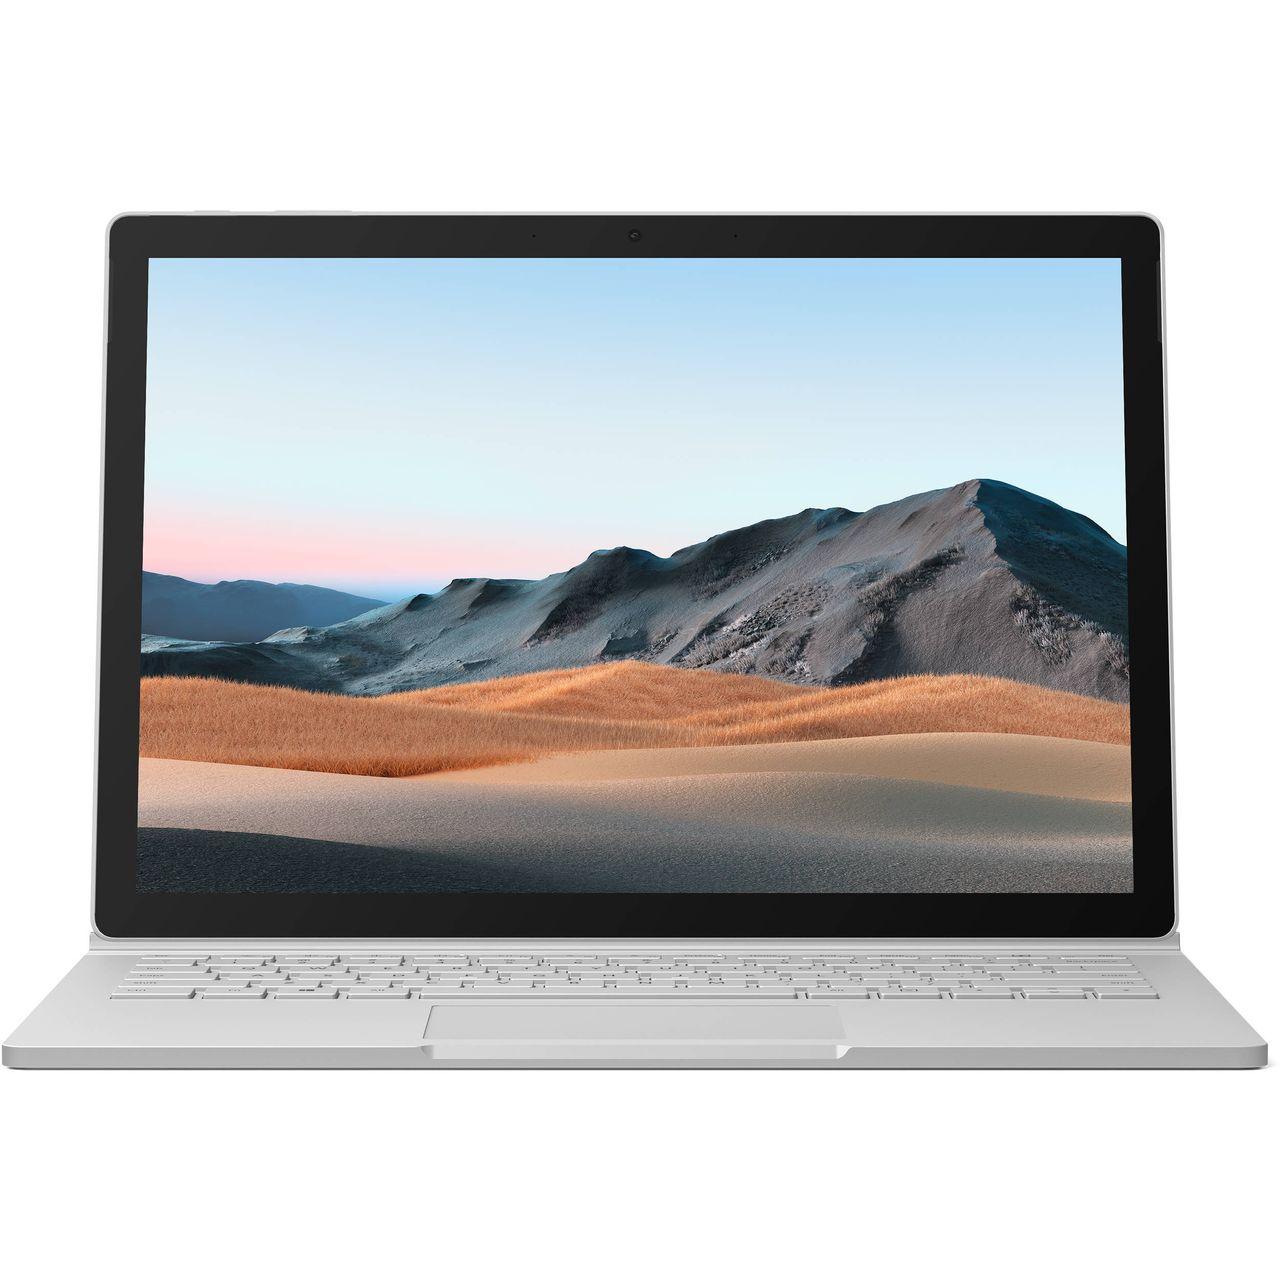 لپ تاپ ۱۳ اینچی مایکروسافت مدل Surface Book 3- F